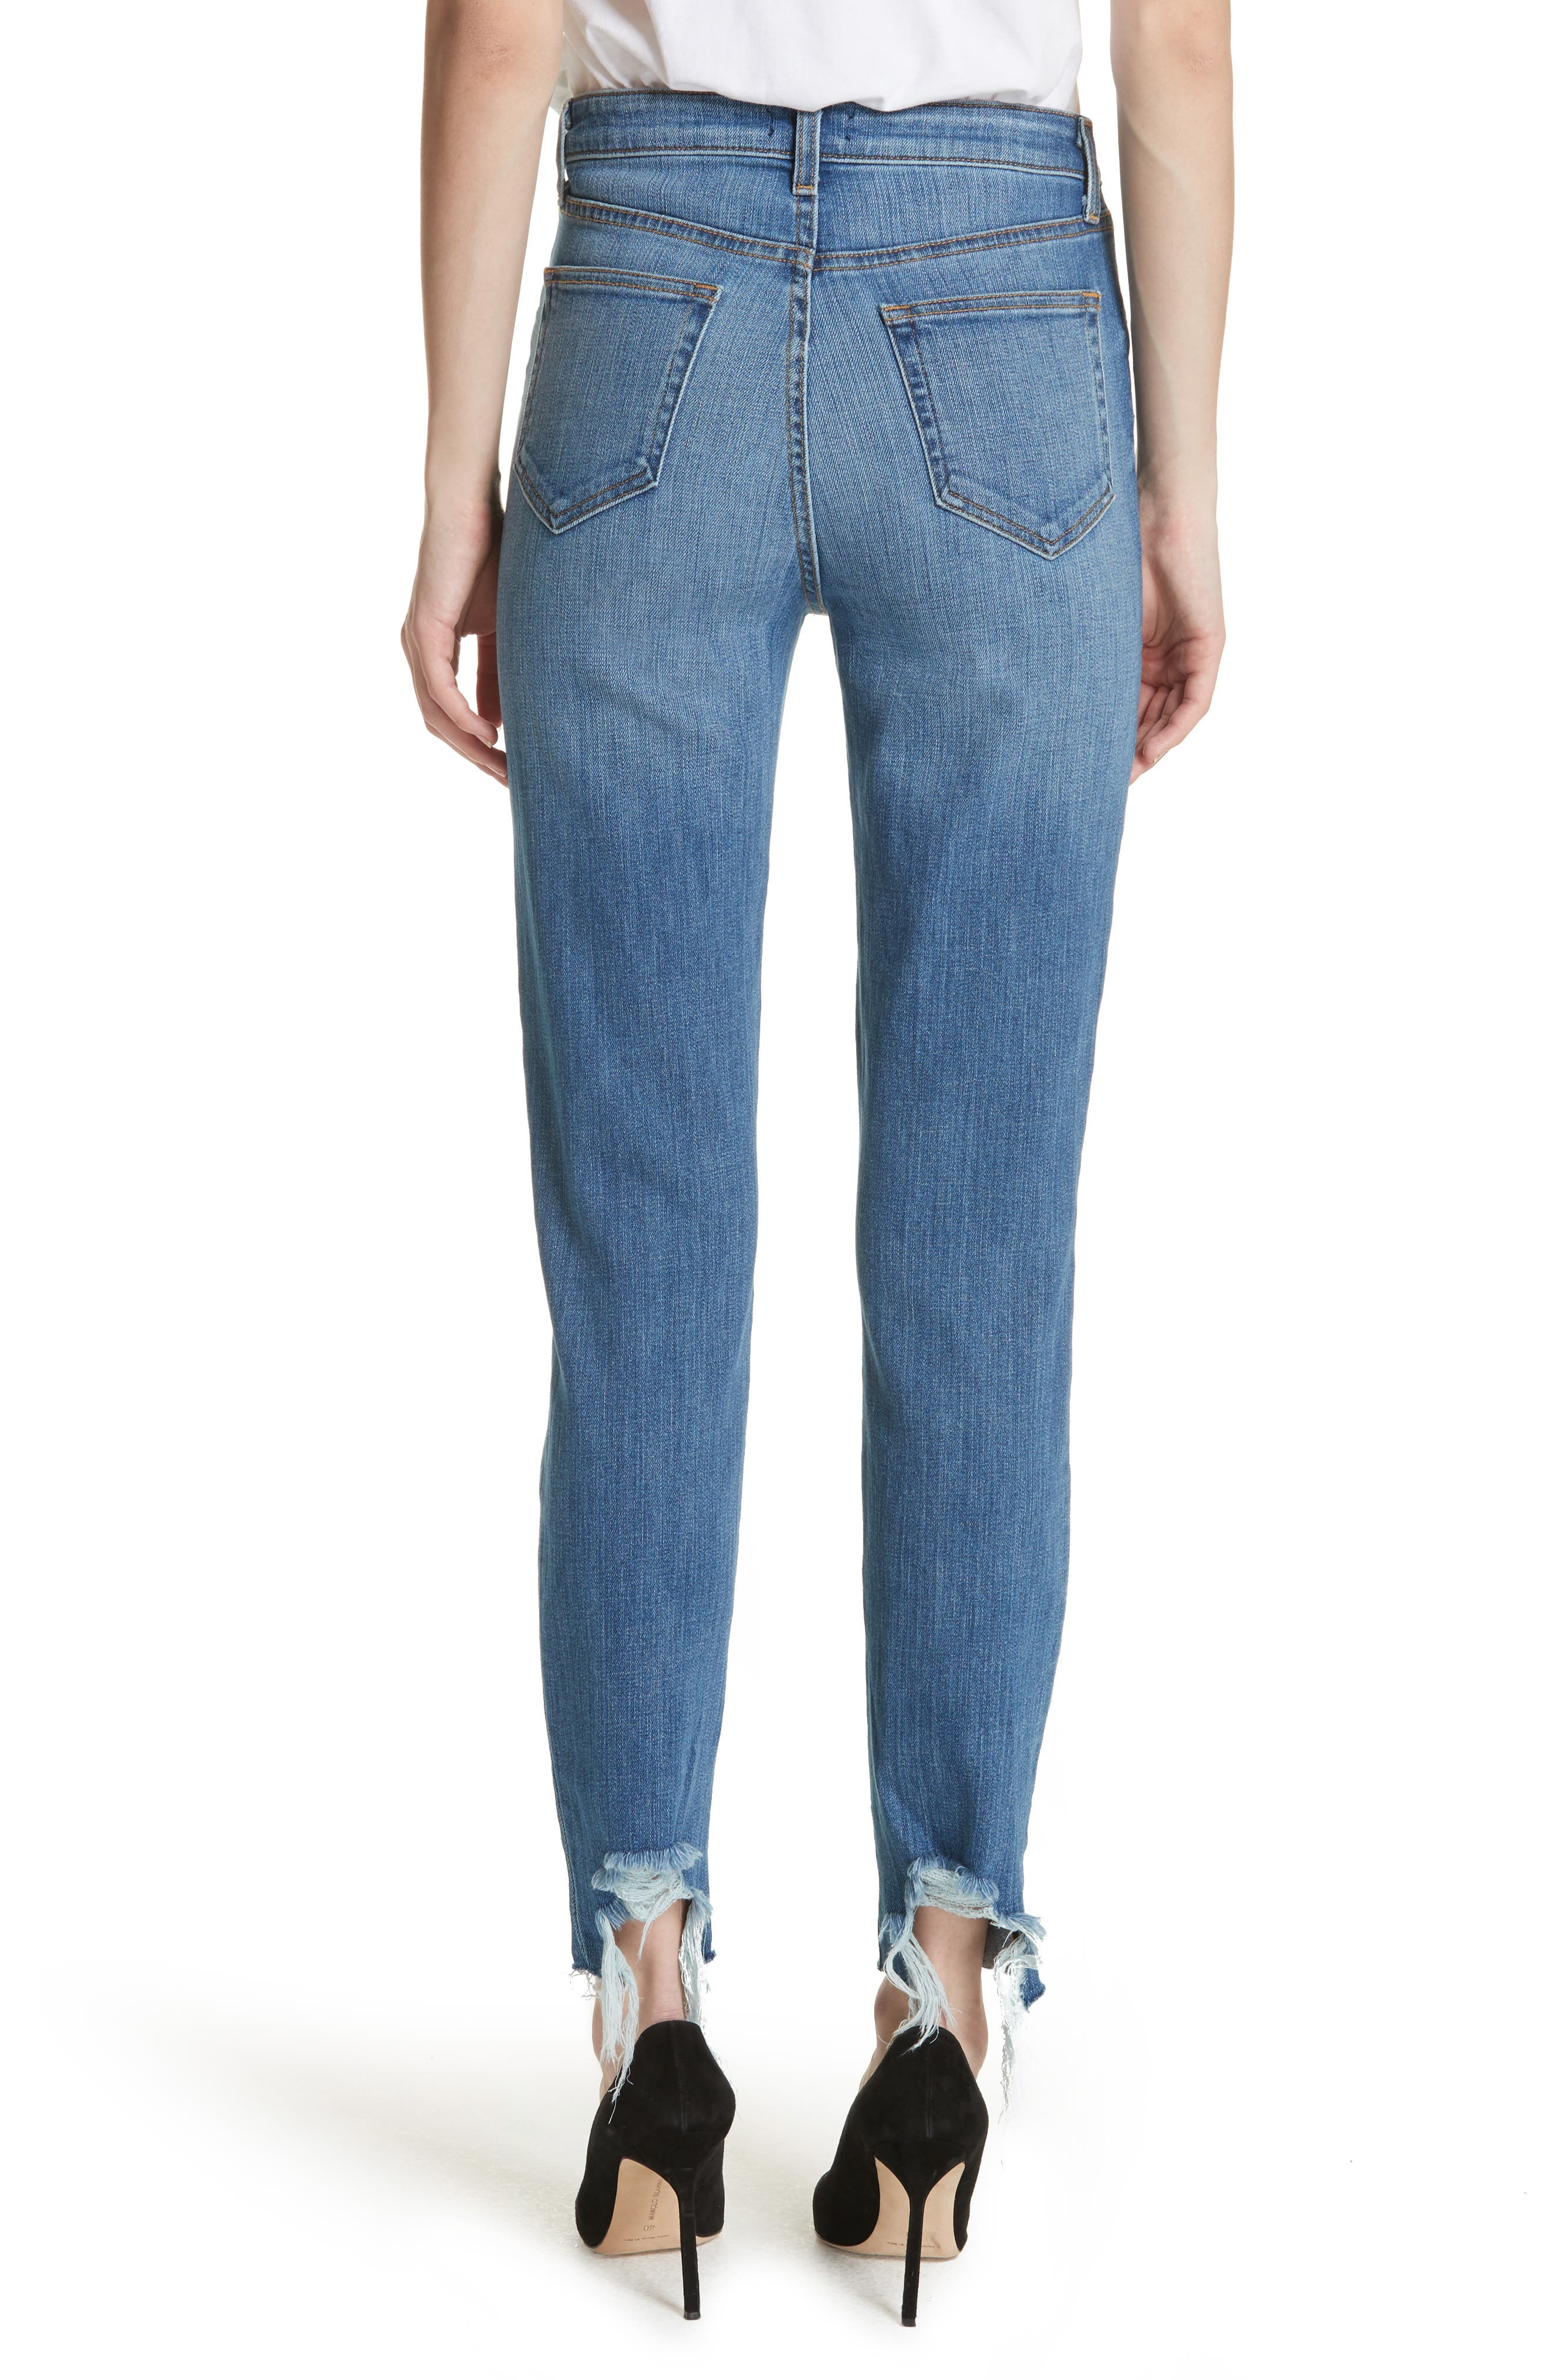 Lorelei High Waist Slim Straight Jeans,                             Alternate thumbnail 2, color,                             450